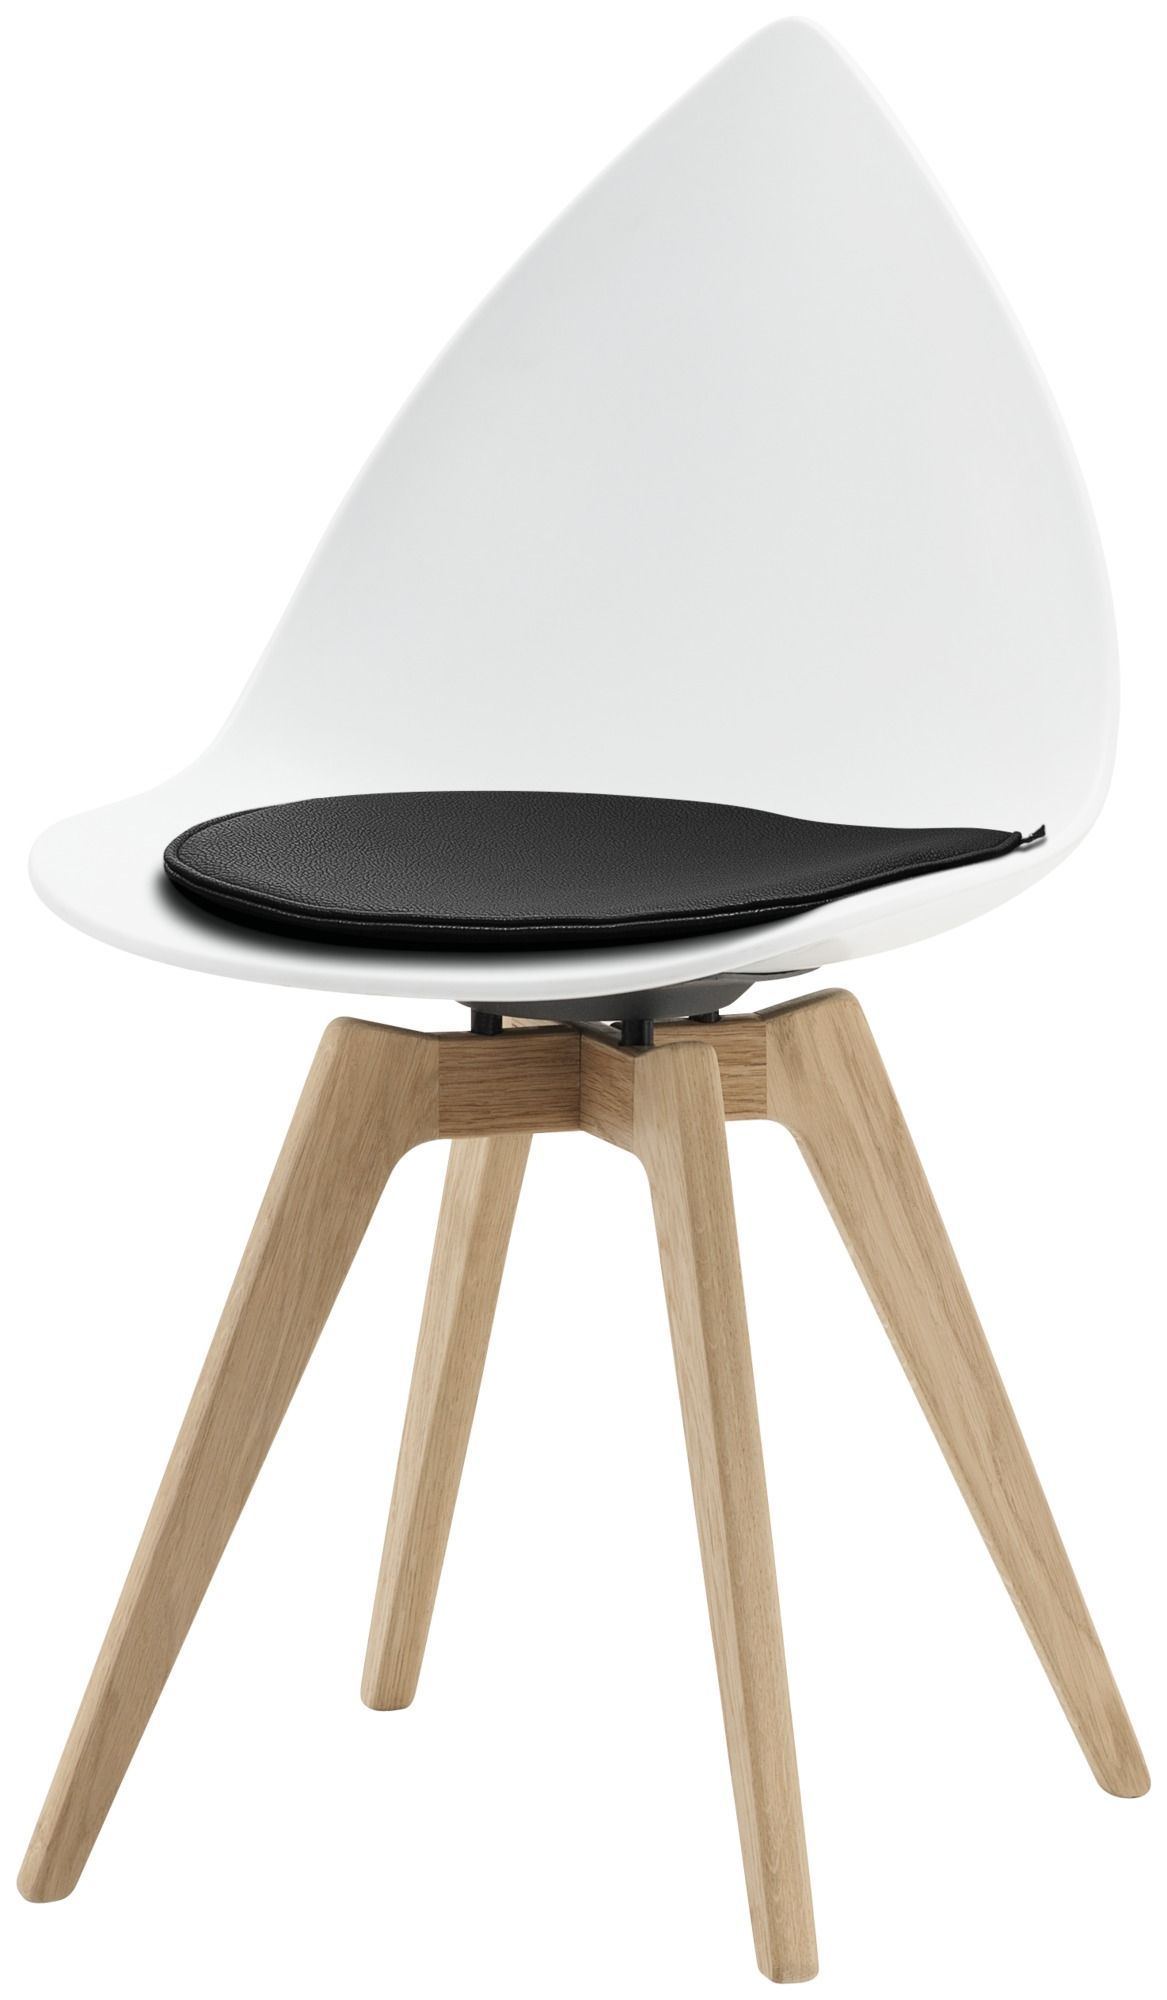 danska möbler online